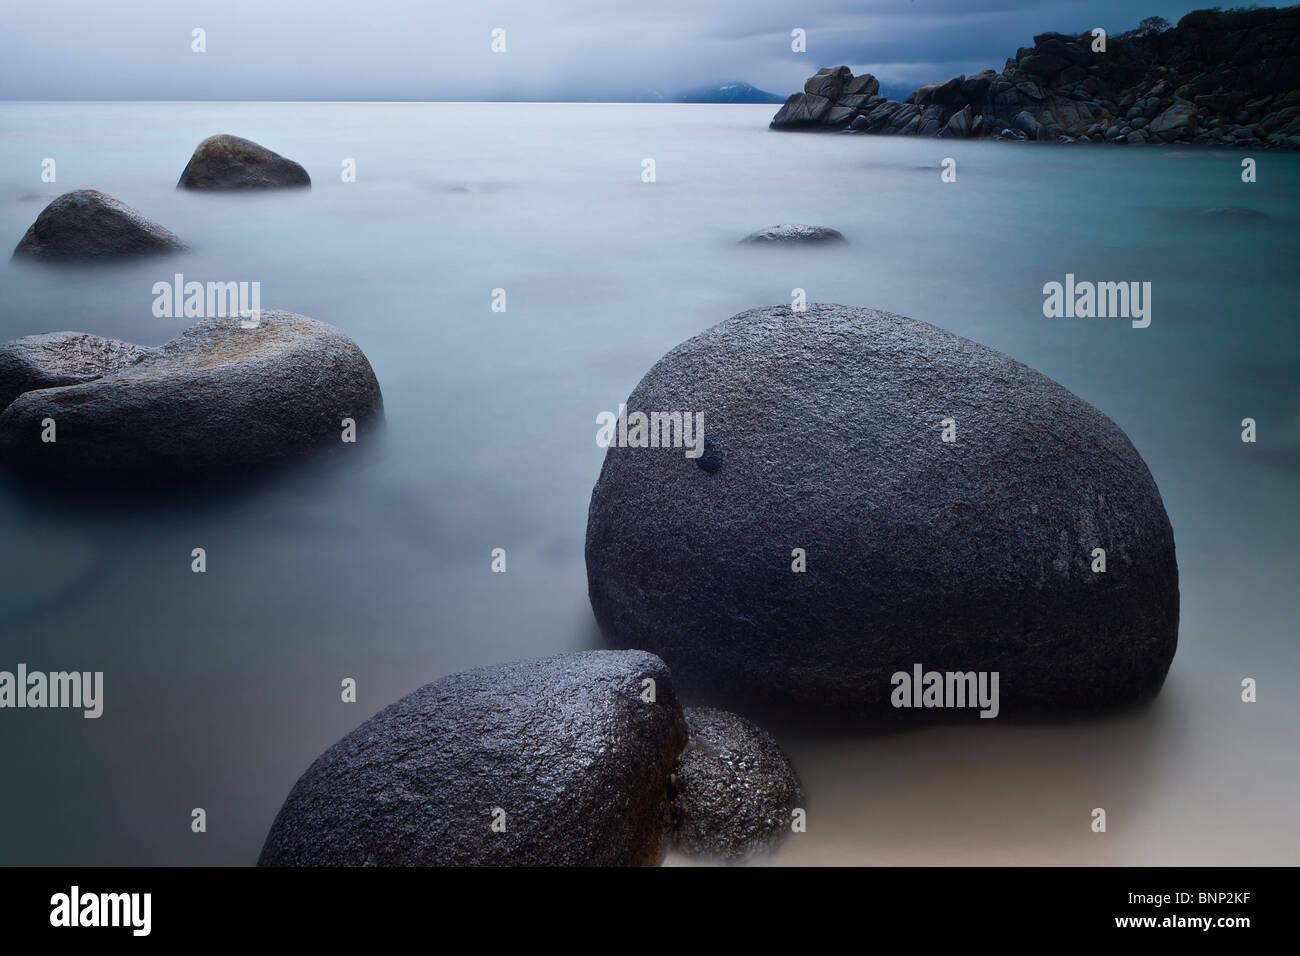 Boulders and still water at Hidden Beach, Lake Tahoe, Nevada, USA - Stock Image